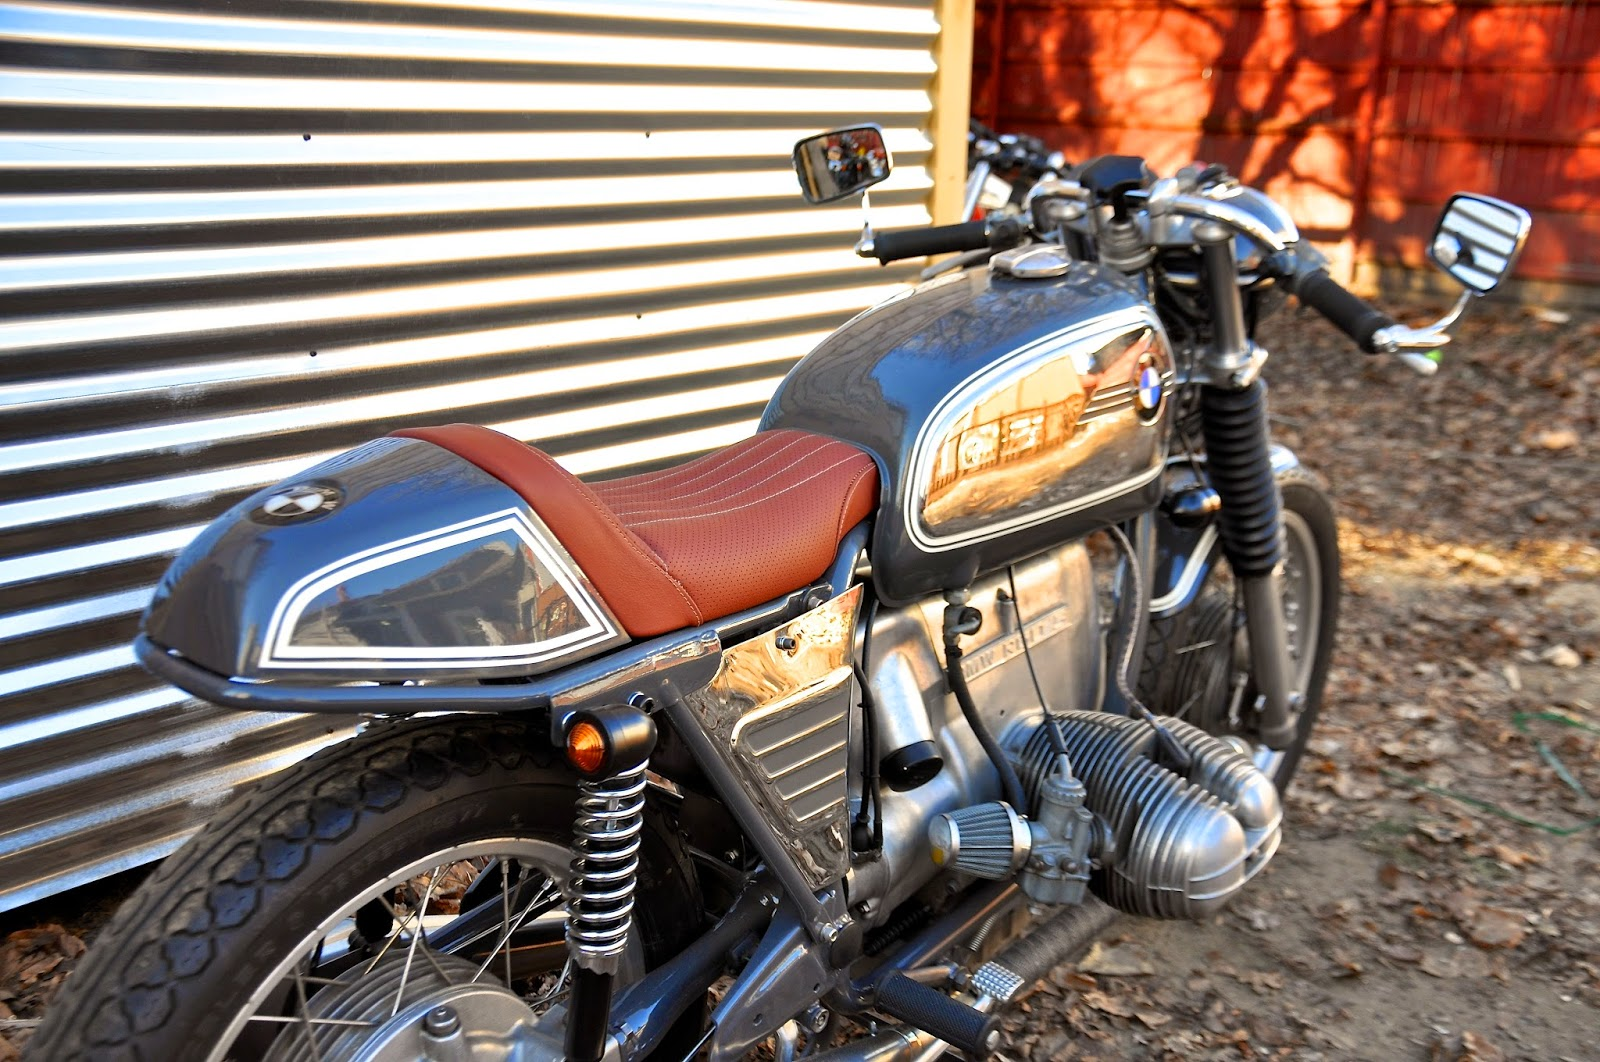 counter balance motorcycles bmw r60 5 cafe racer. Black Bedroom Furniture Sets. Home Design Ideas